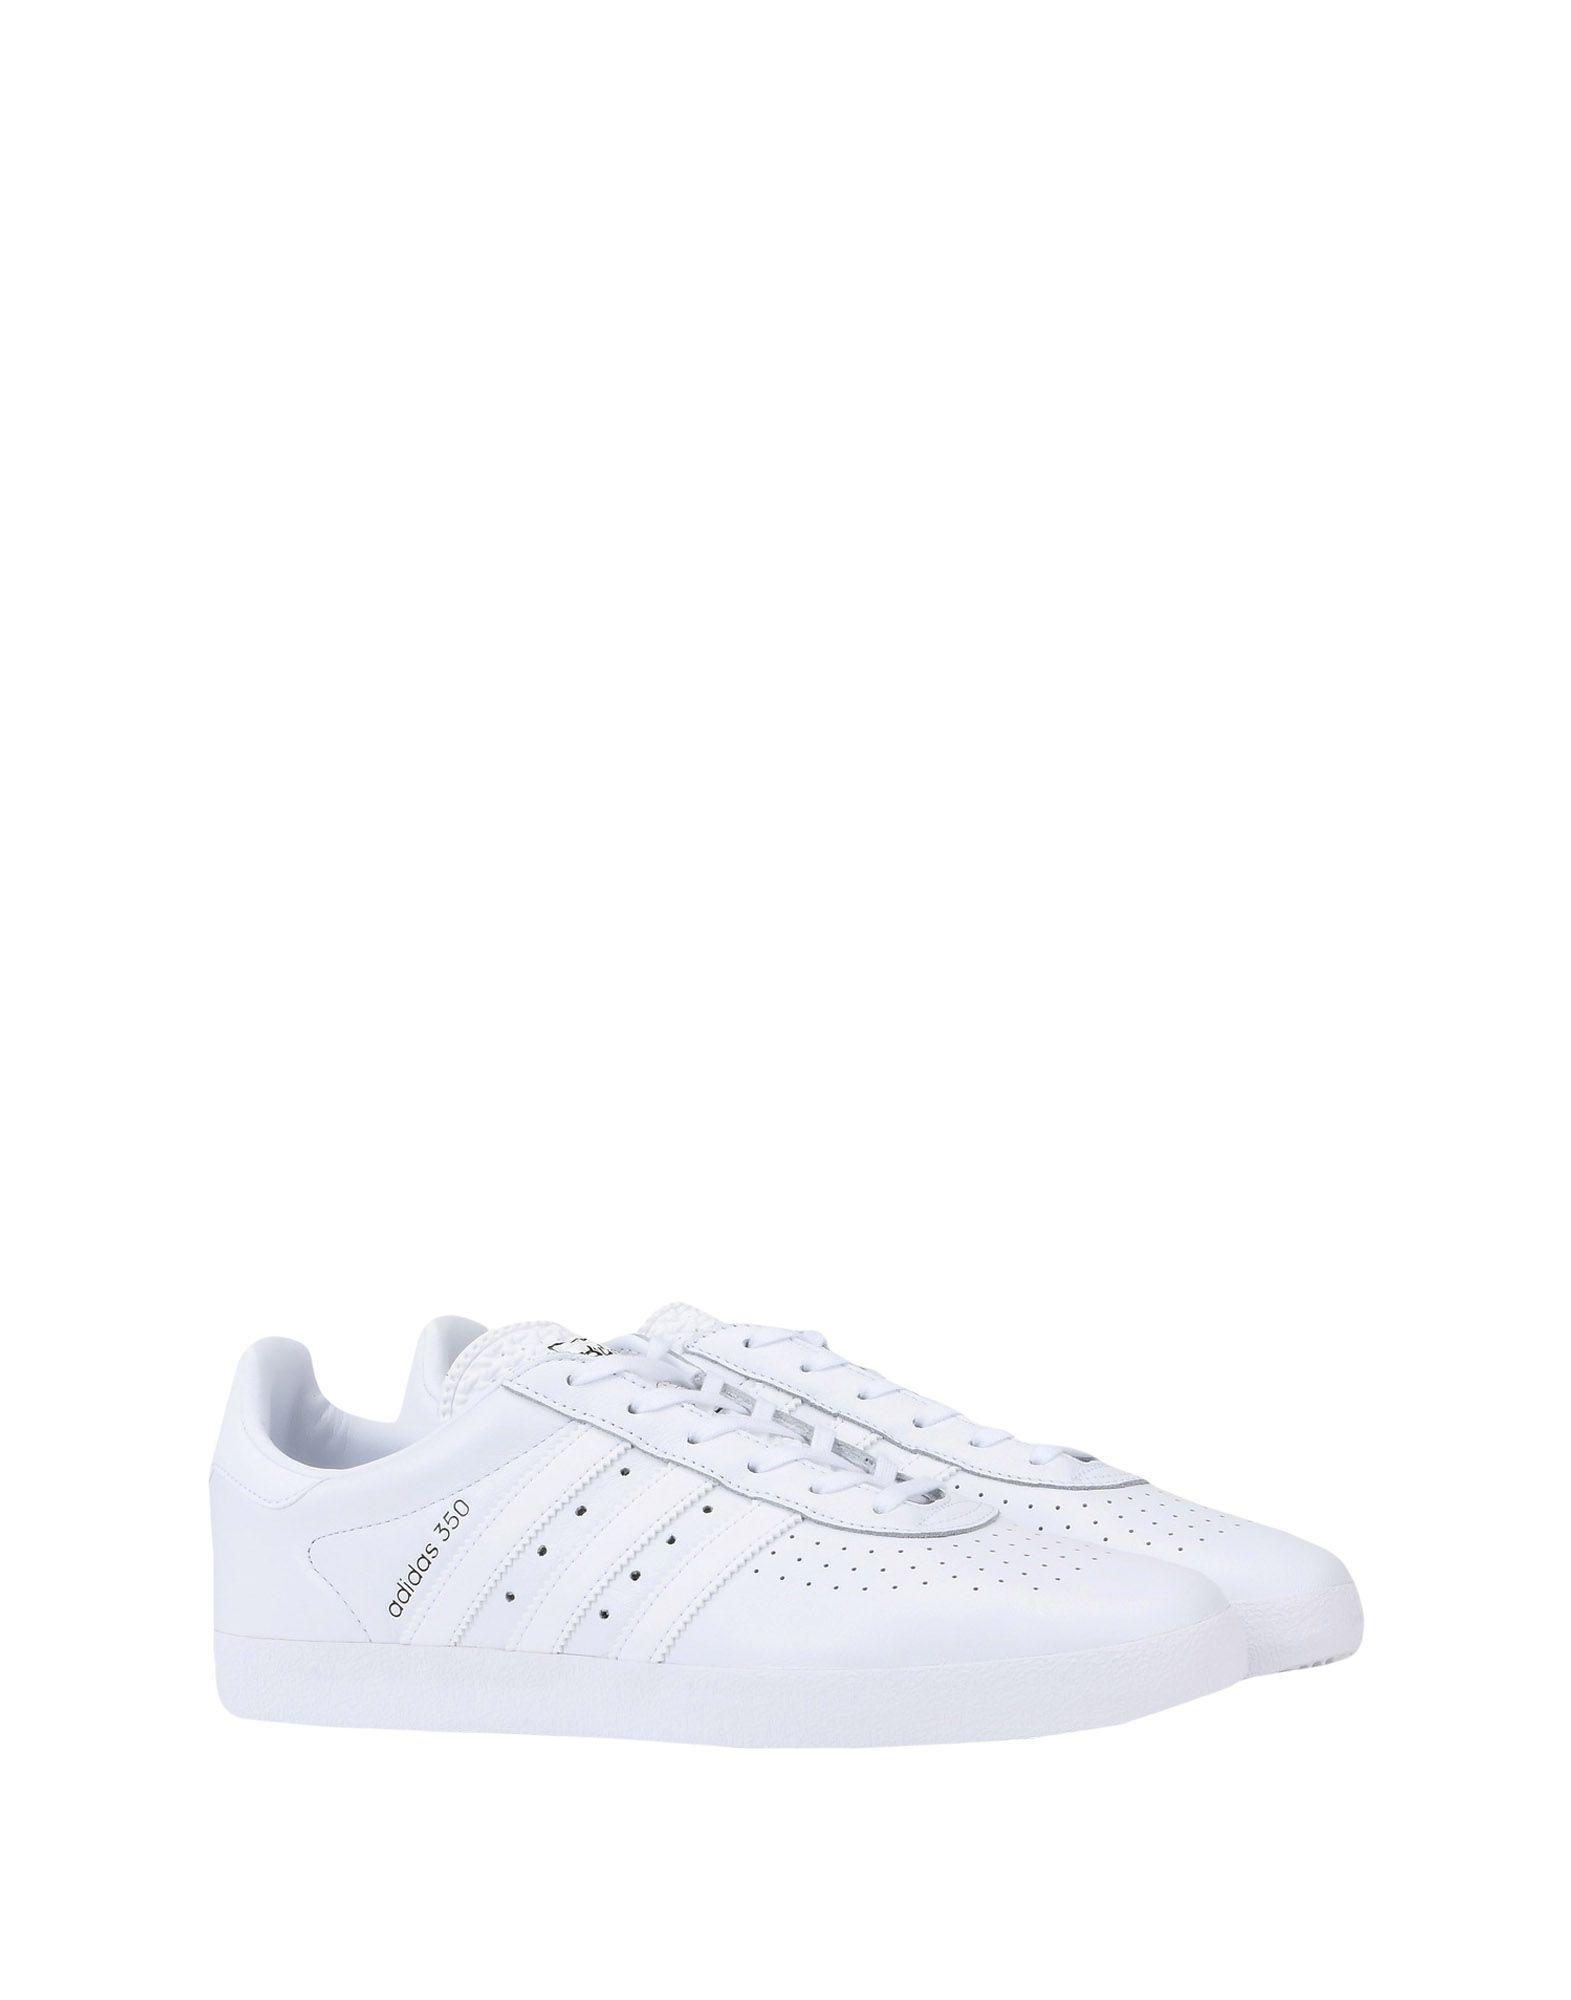 Adidas Adidas Adidas Originals Adidas 350  11269799TD Neue Schuhe 95f562